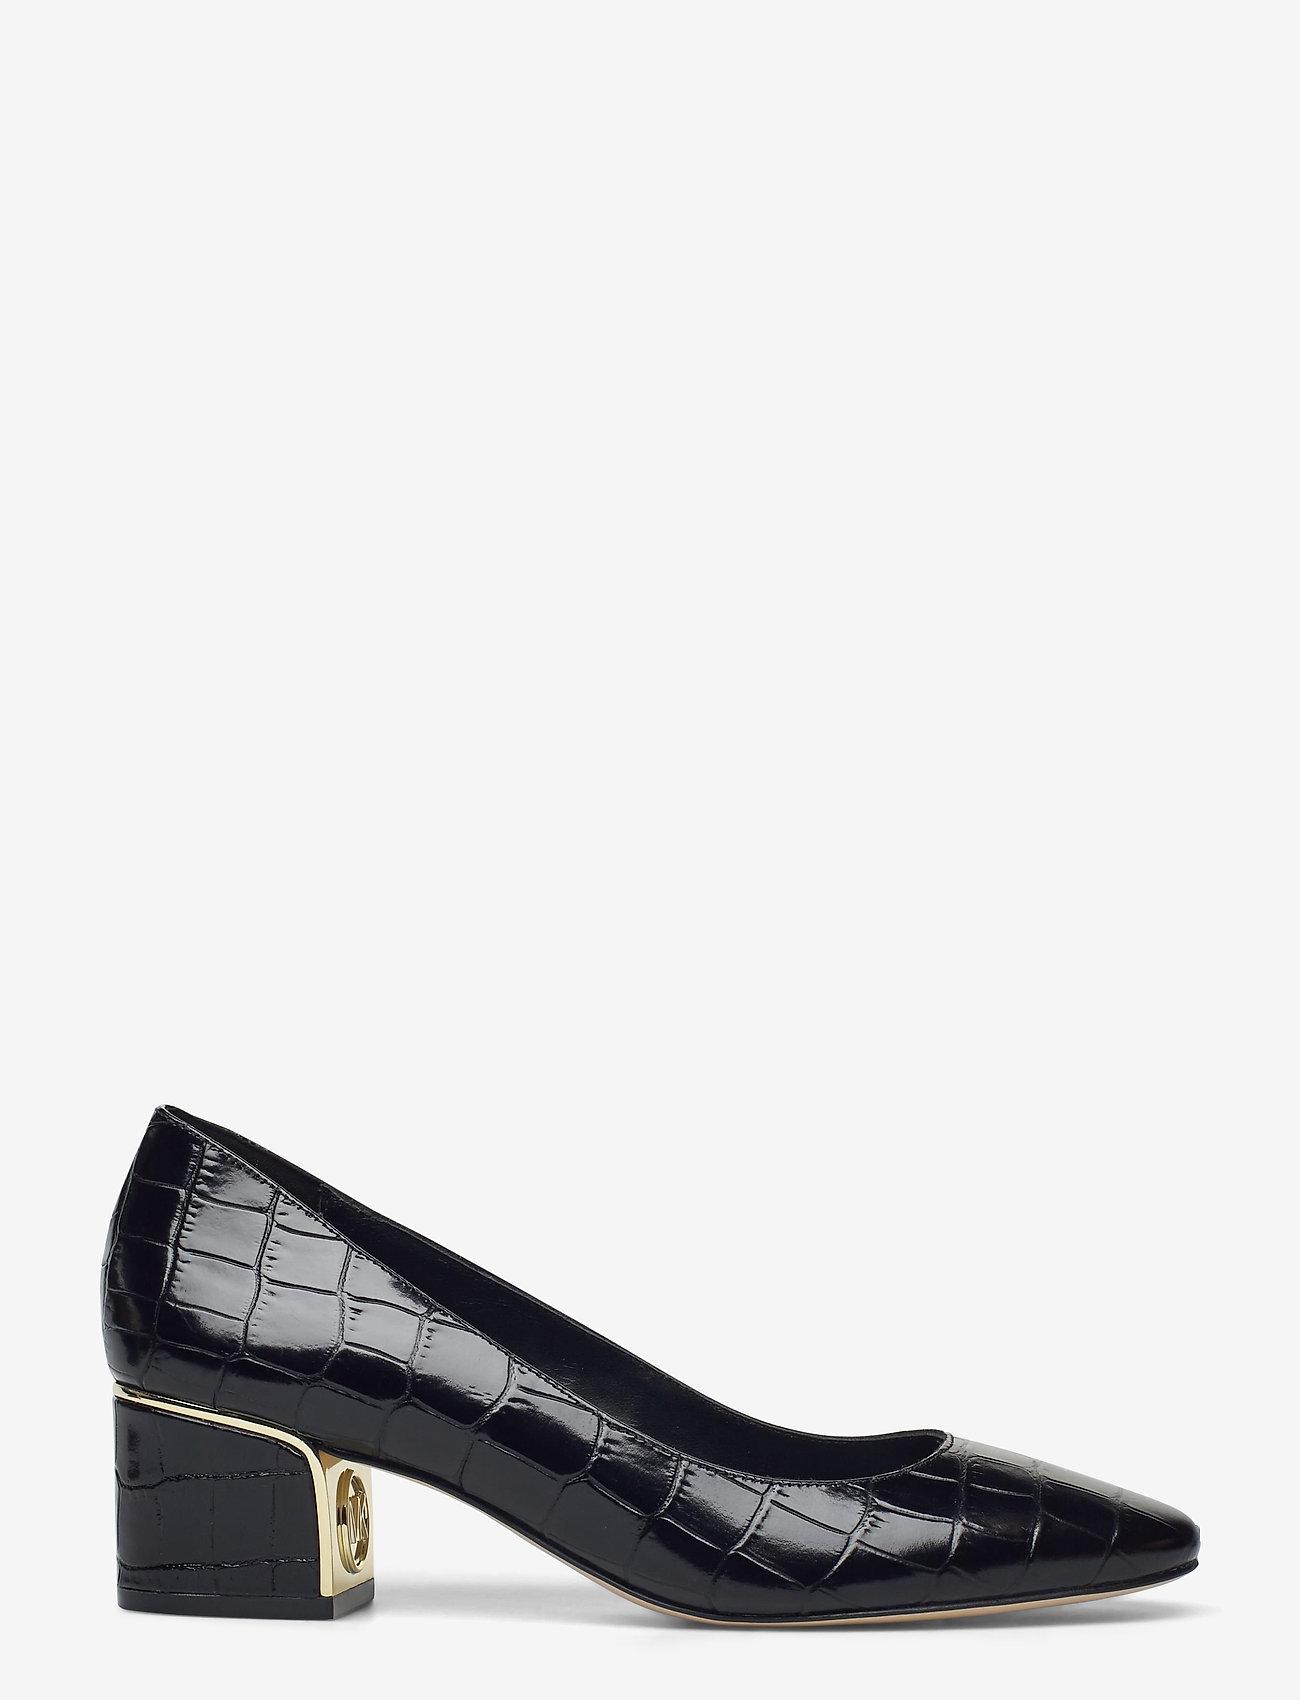 Michael Kors Shoes - LANA PUMP - klassieke pumps - black - 1